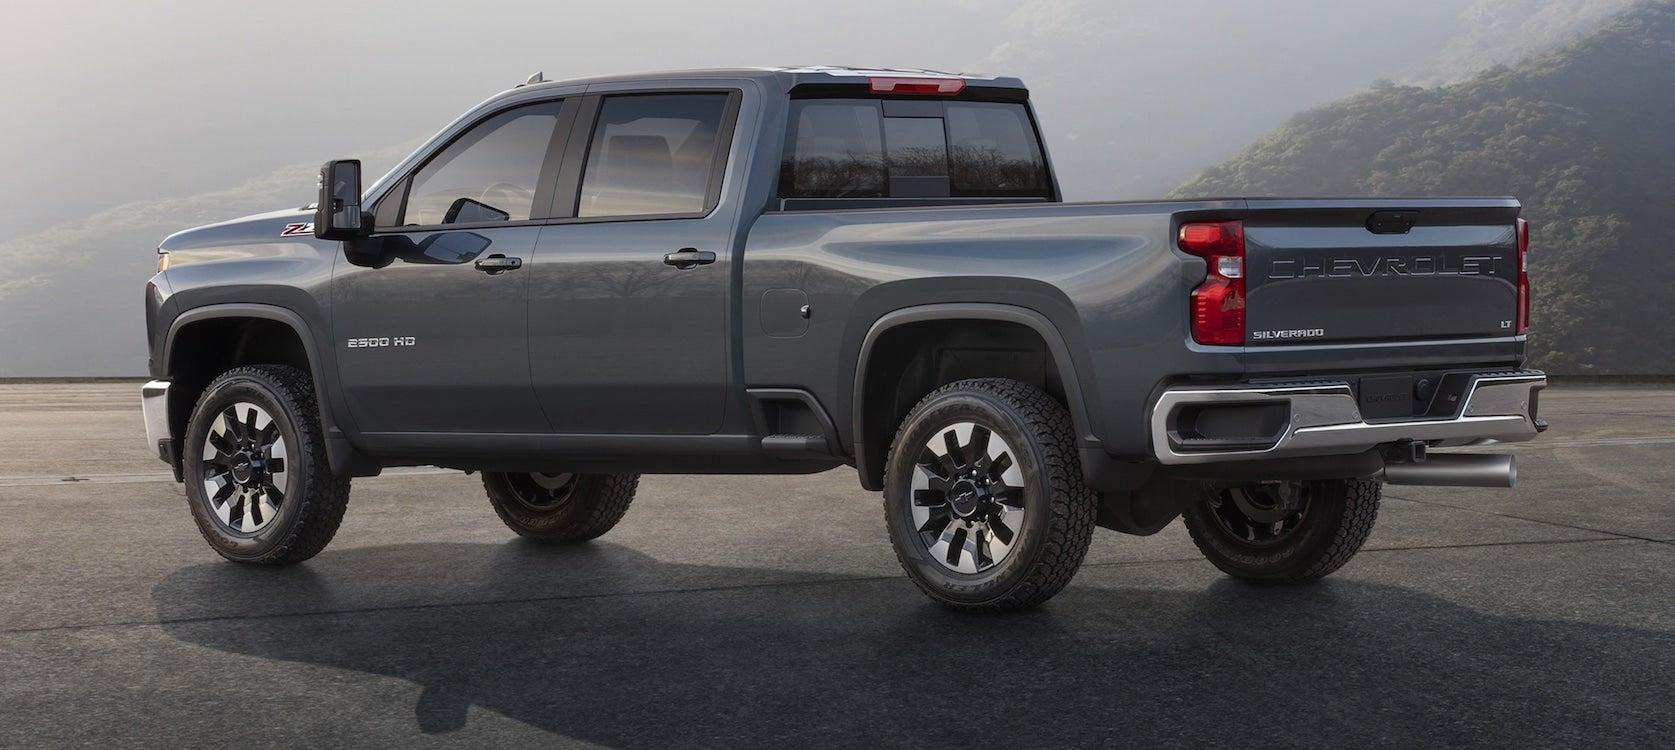 Chevy Rolls Out New Silverado HD | TheDetroitBureau.com